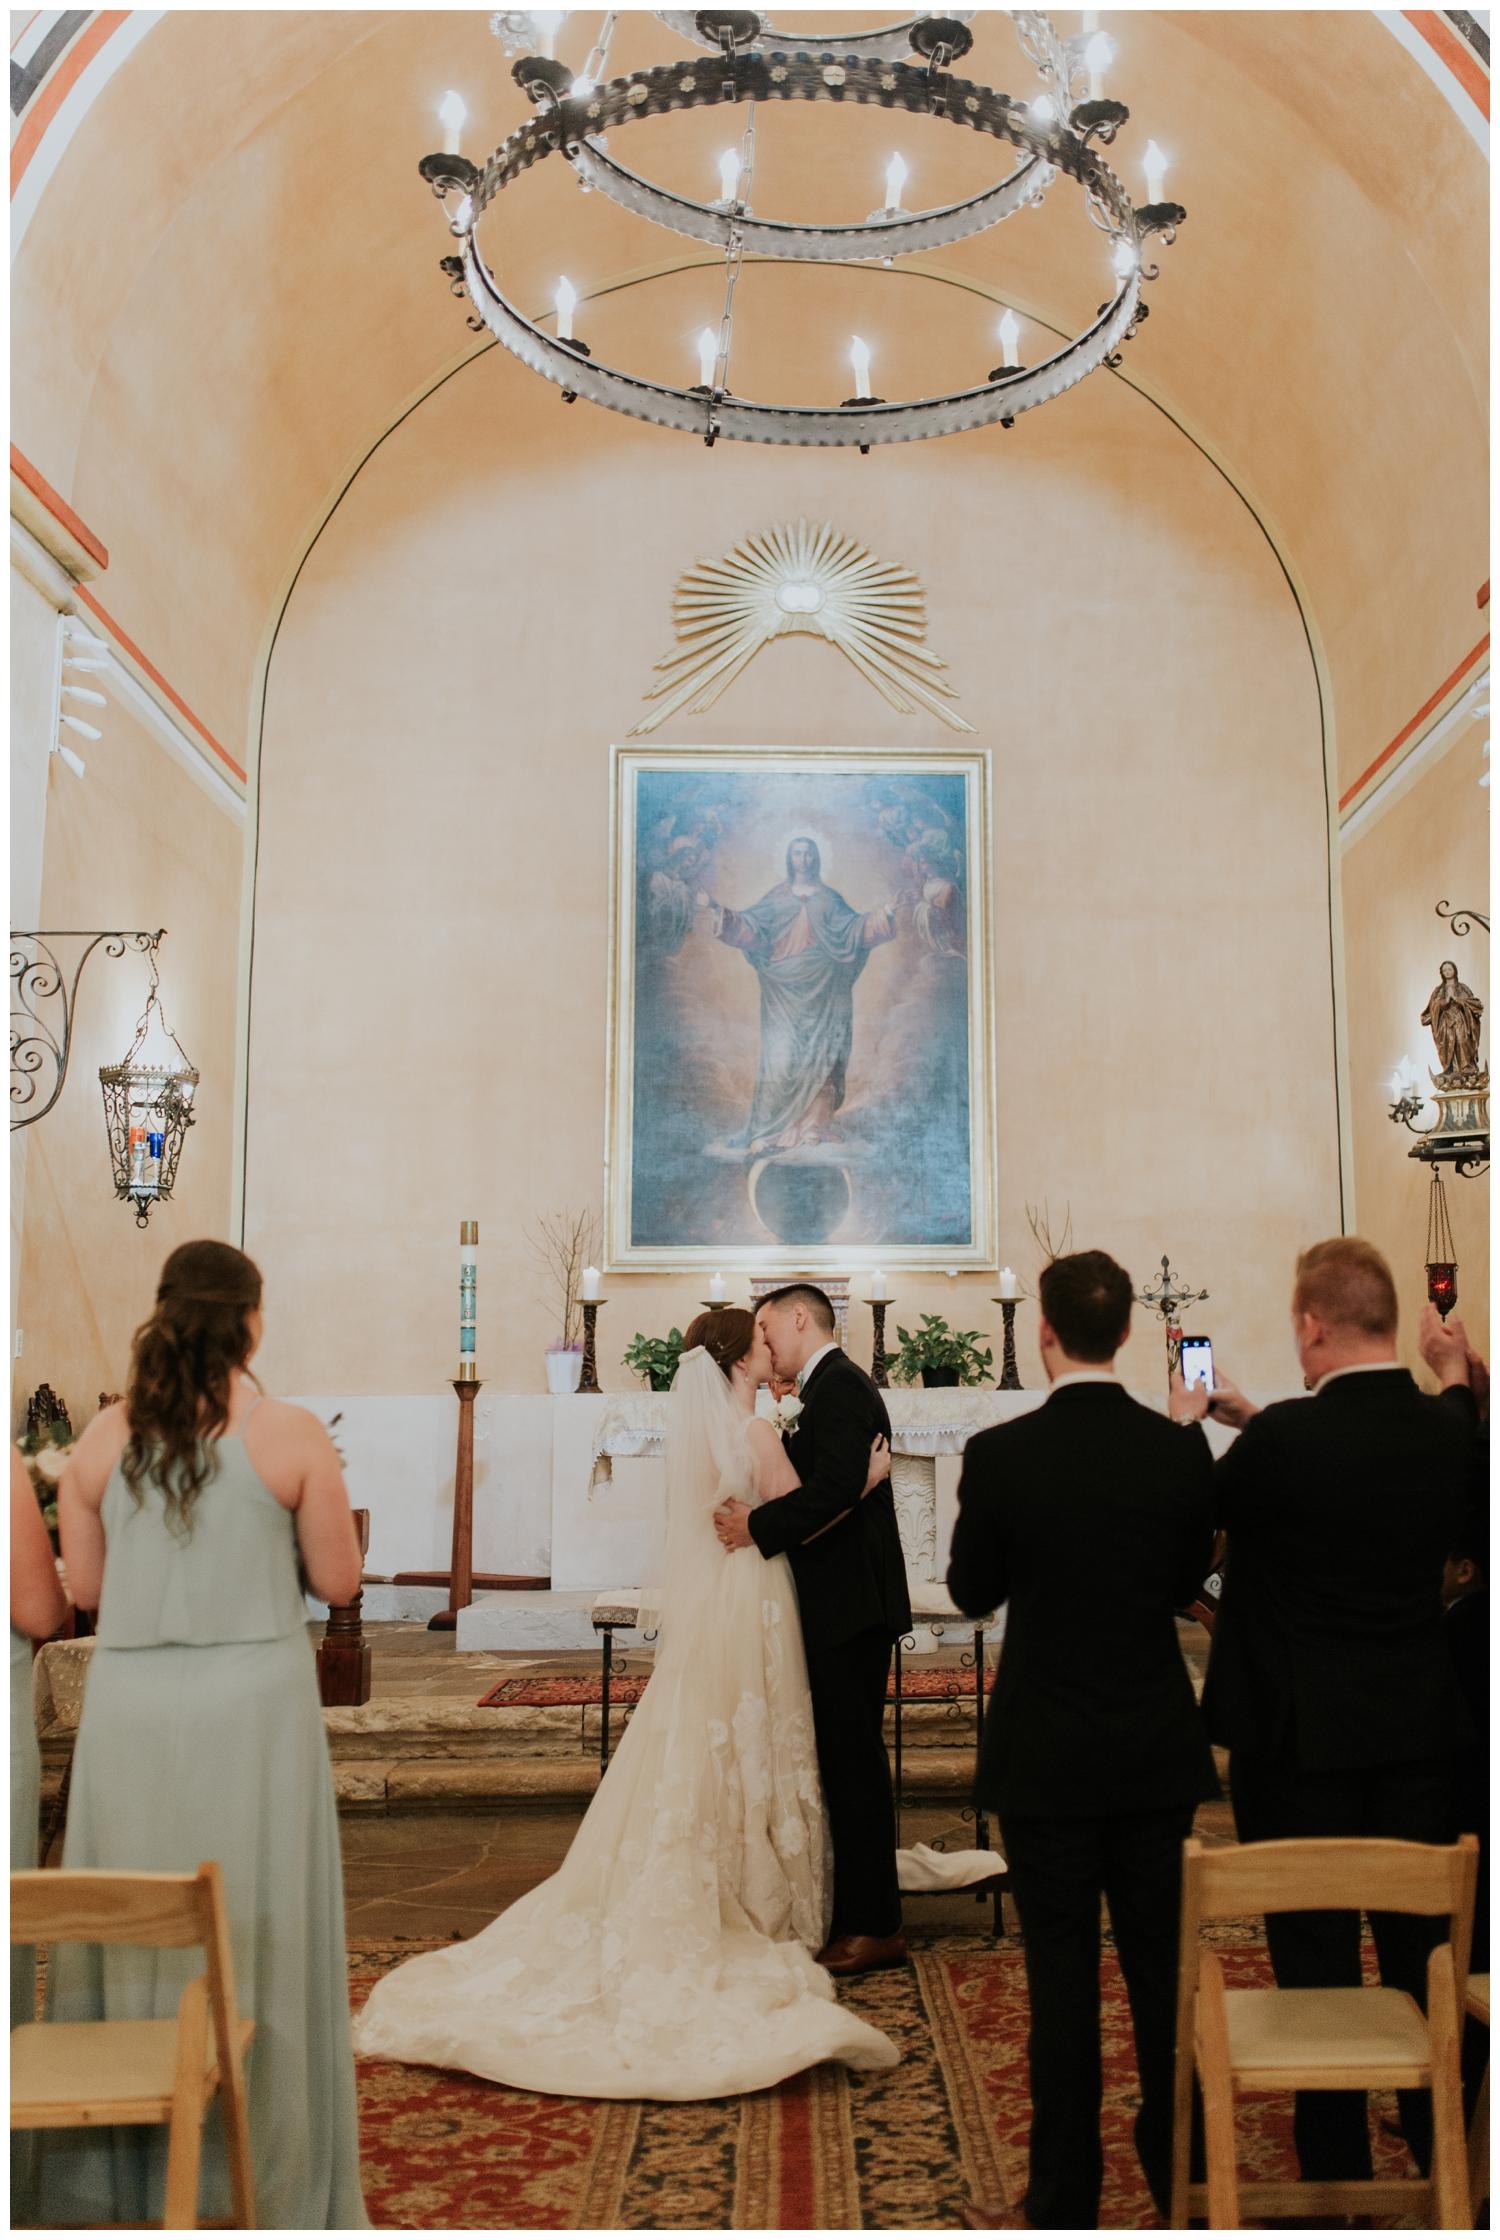 Jenna+Brandon, Mission Concepcion Wedding, San Antonio, Contista Productions Wedding Photography_0130.jpg